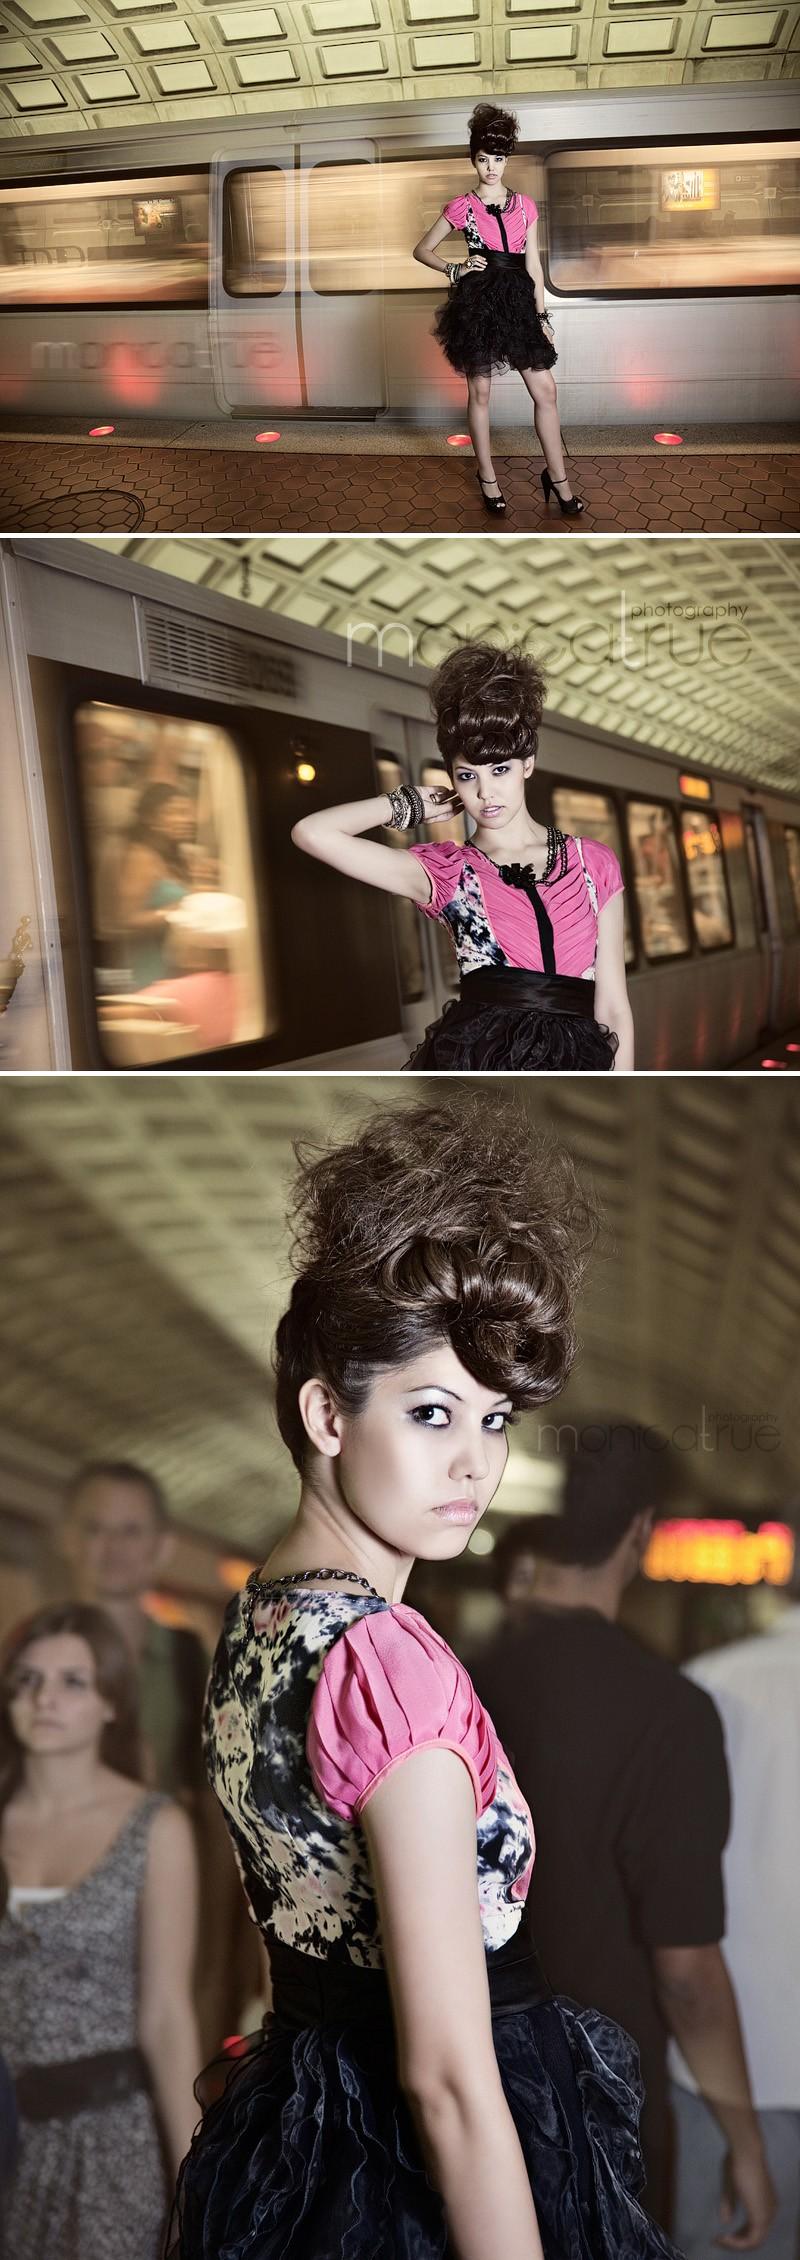 Washington Metro Center Jun 05, 2010 © Monica True Hair Styling by Darrell Thompson